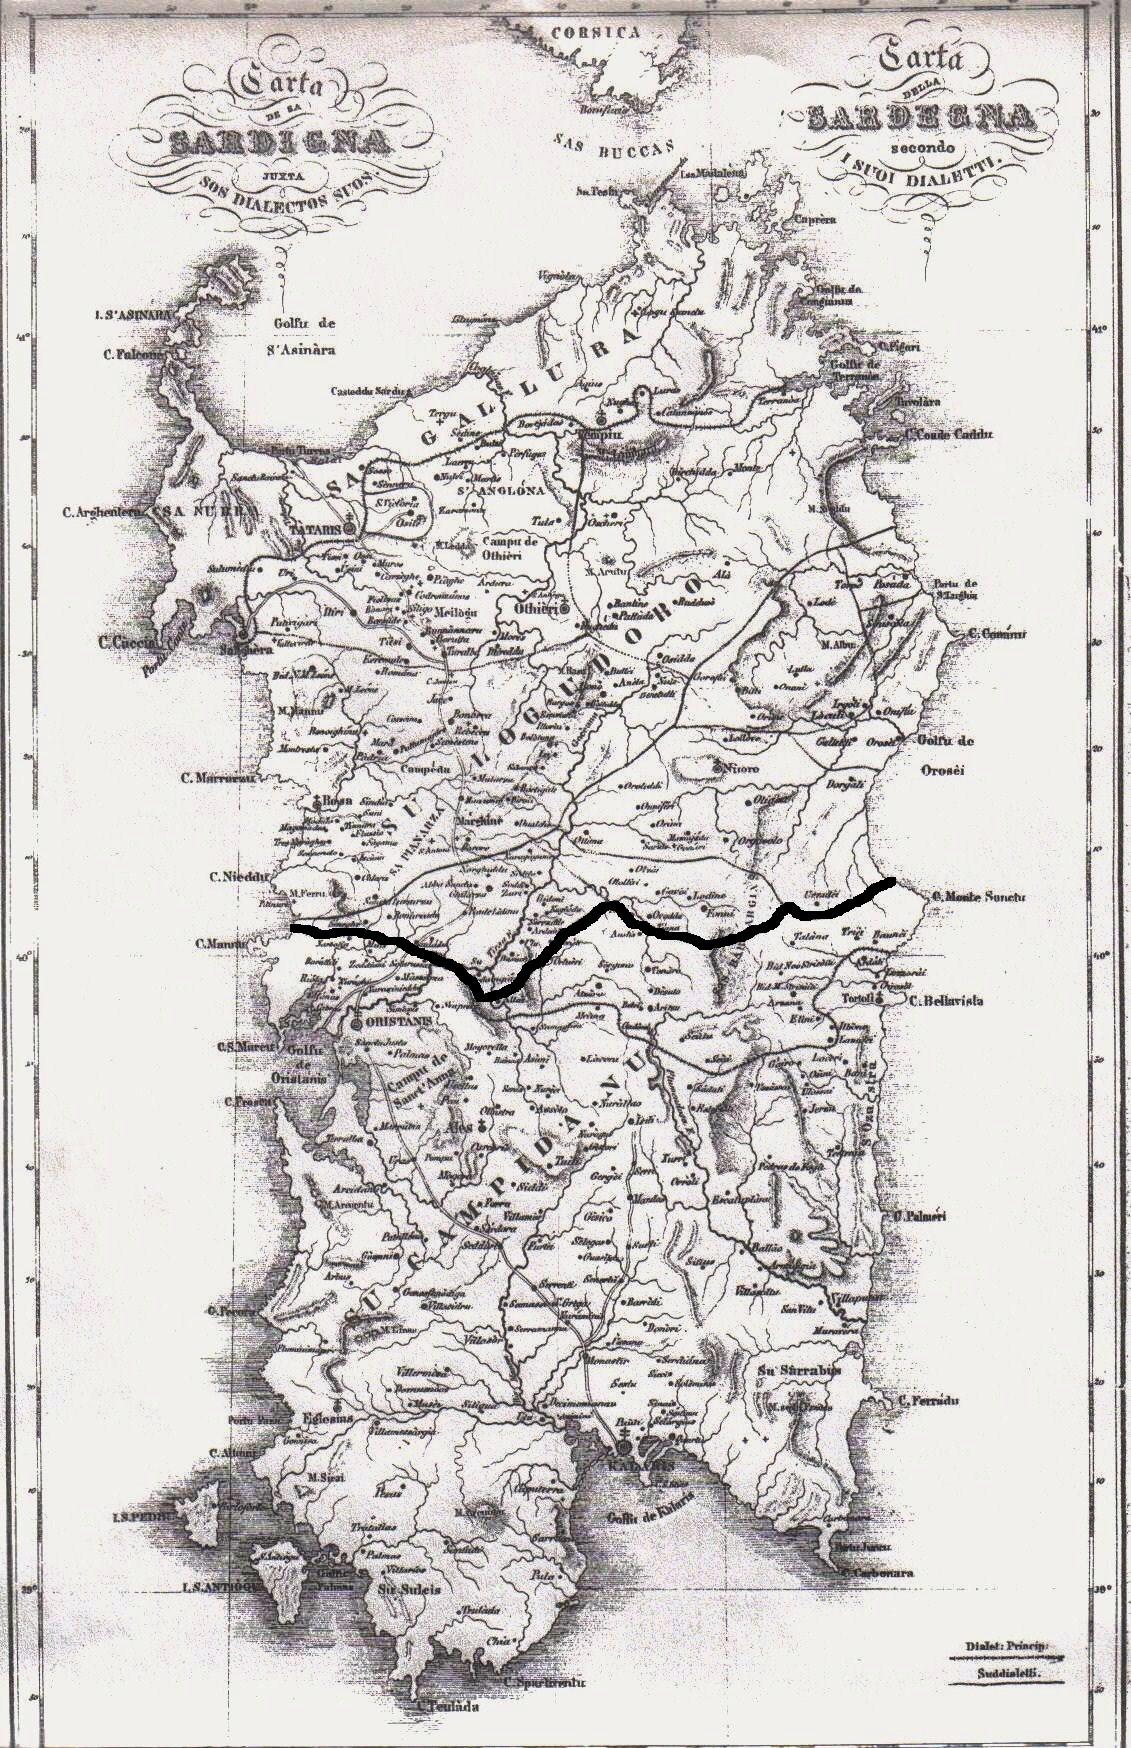 Cartina Antica Sardegna.File Antica Carta Linguistica Sardegna Modificata Jpg Wikimedia Commons